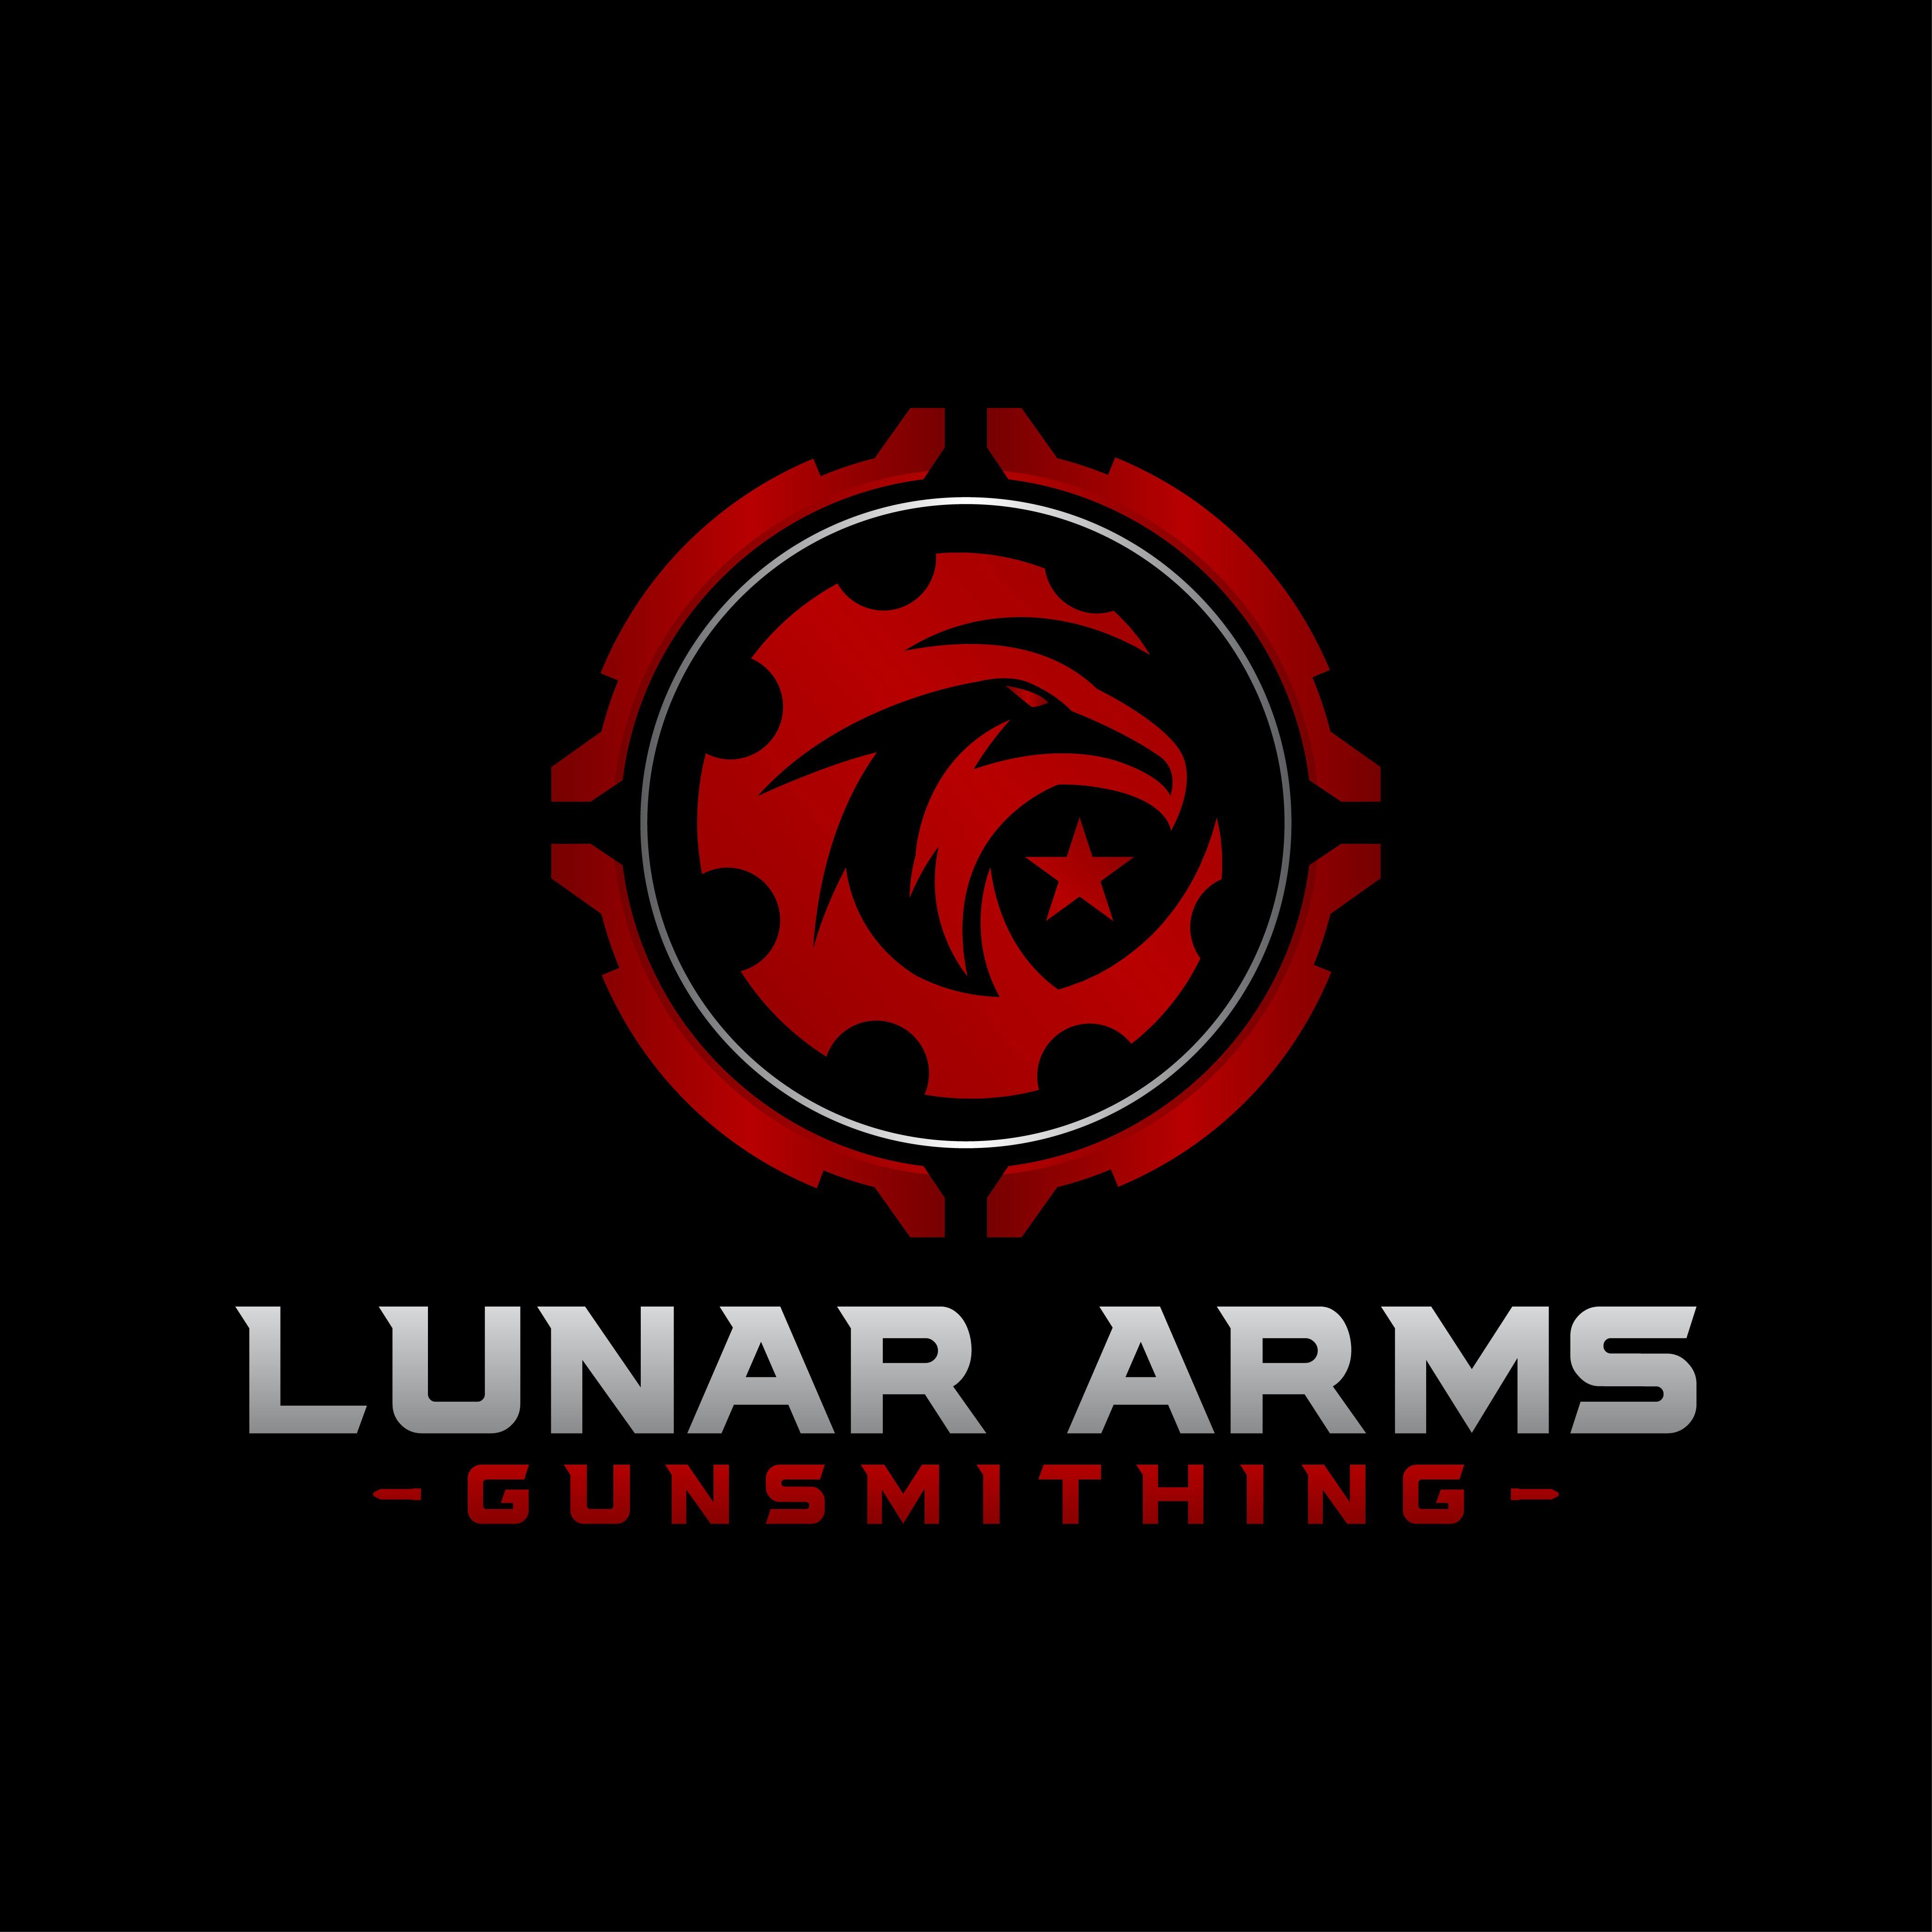 Design a modern edgy firearm logo for new gunsmith